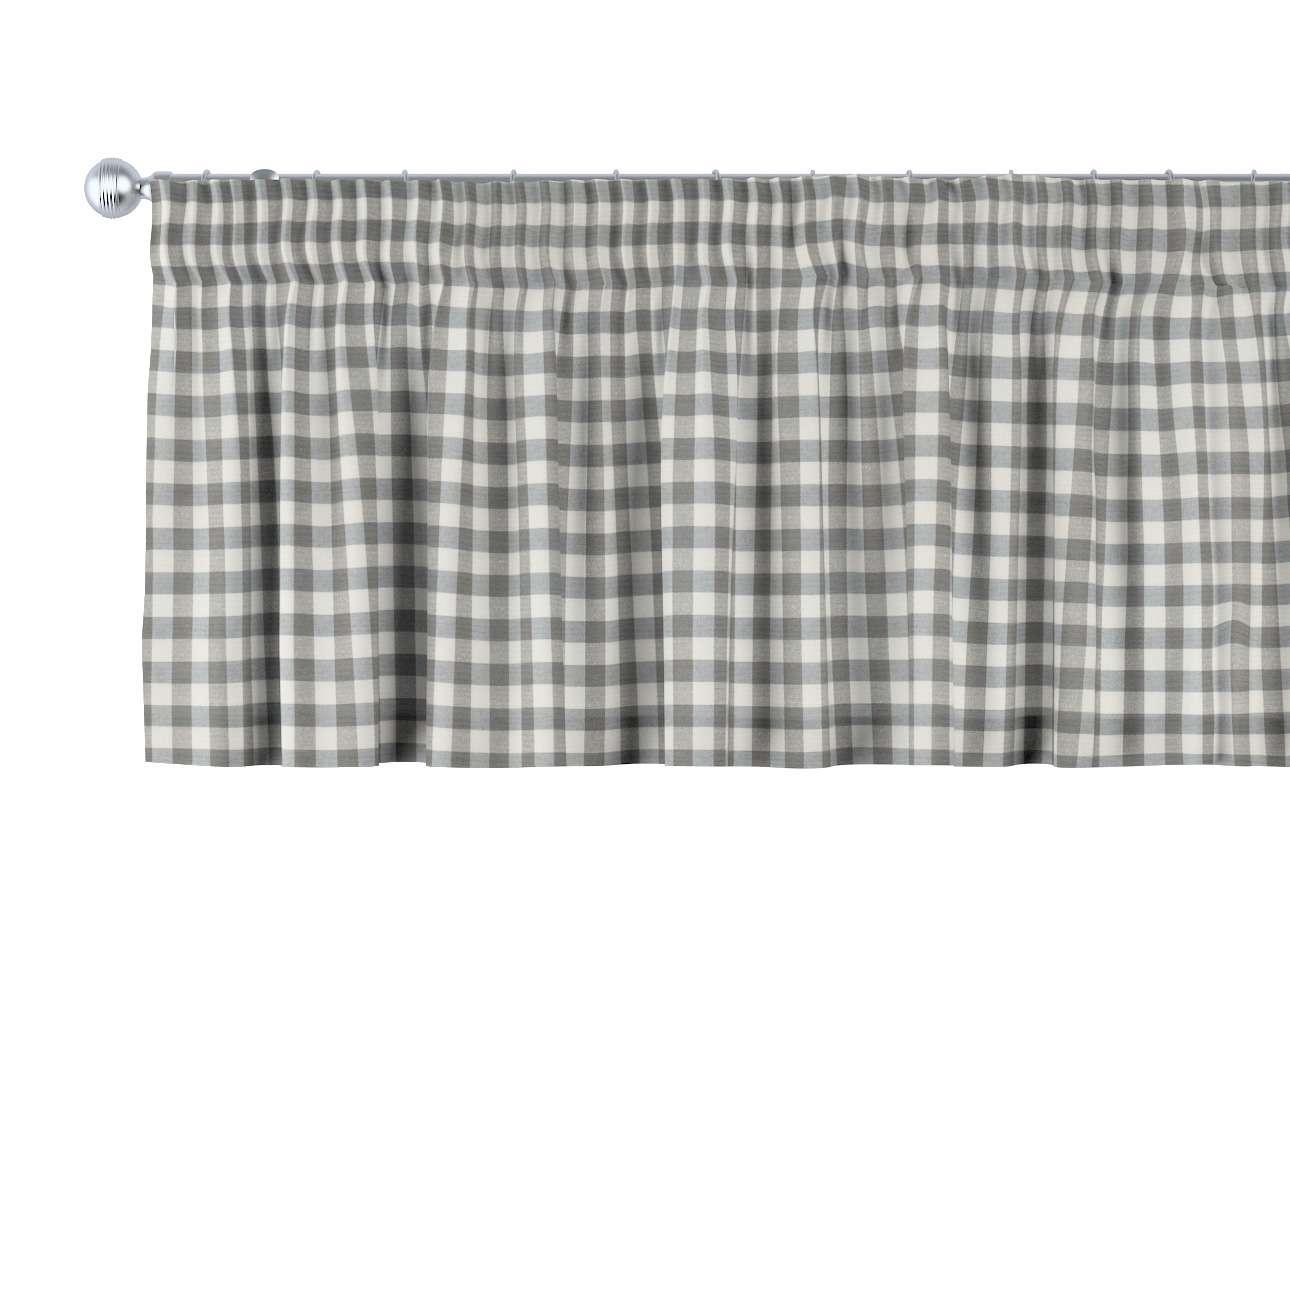 Kurzgardine mit Kräuselband 130 x 40 cm von der Kollektion Quadro, Stoff: 136-11